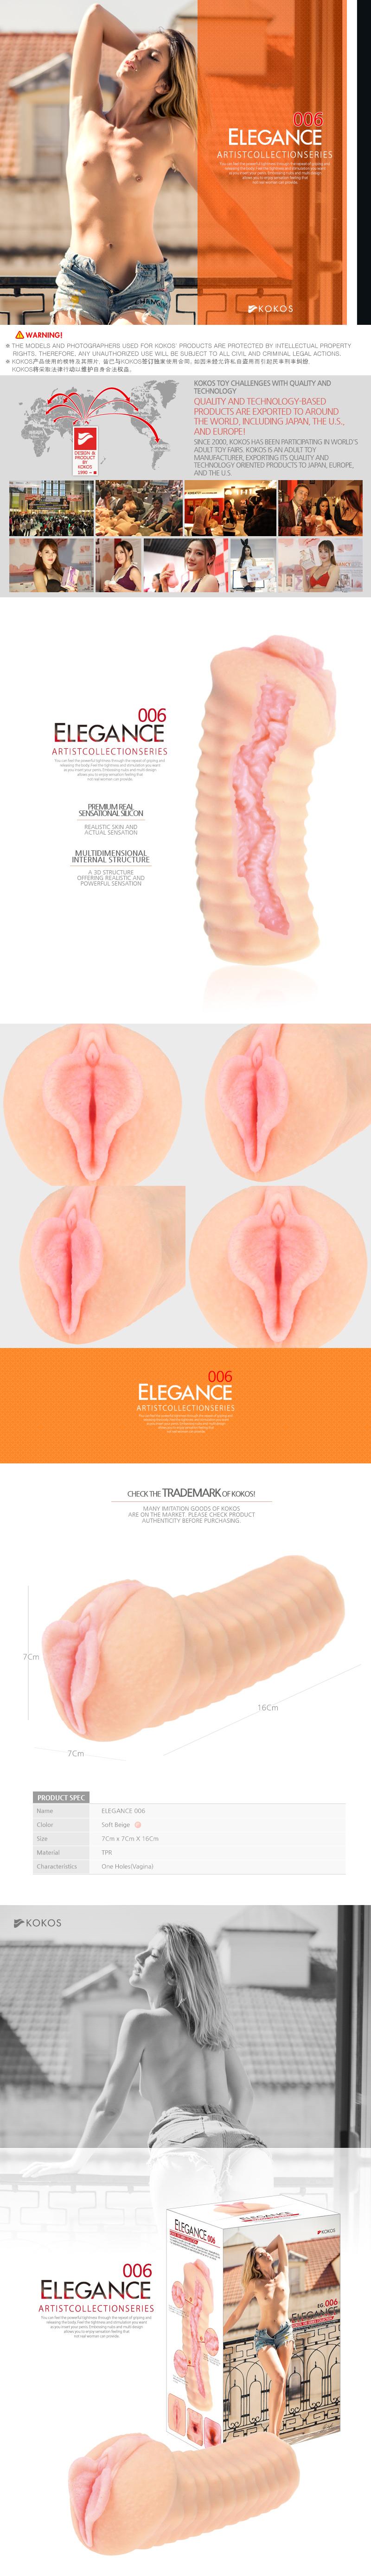 Elegance 006